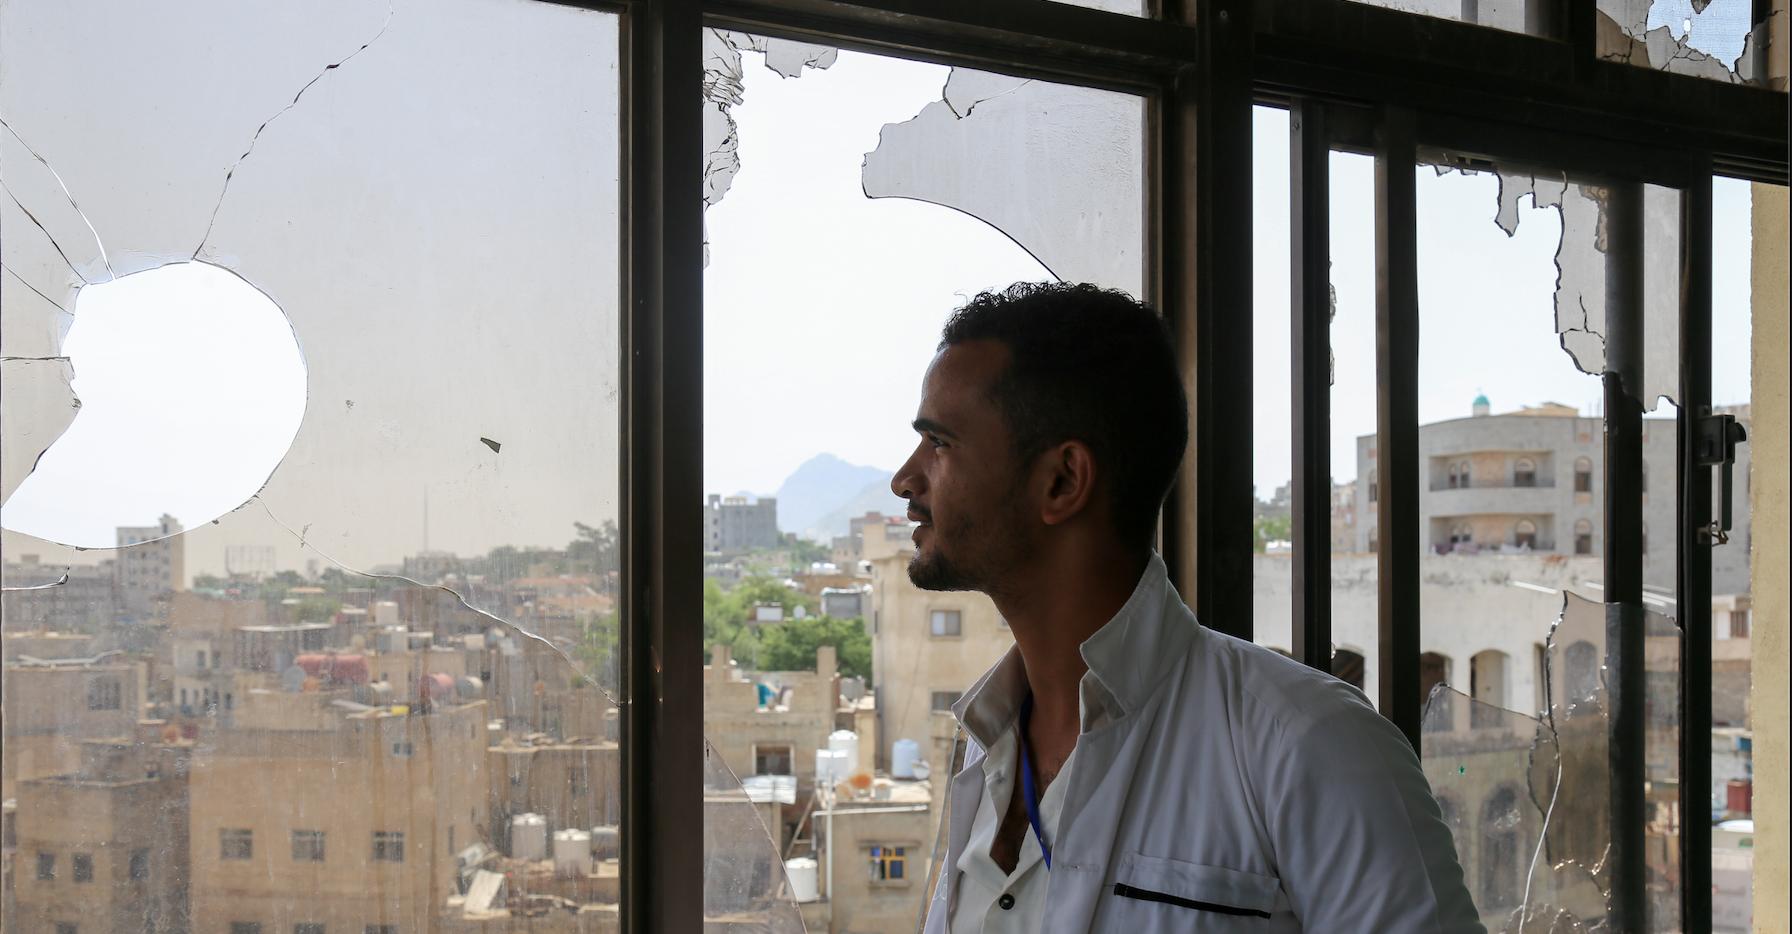 A man looking through the window in Yemen